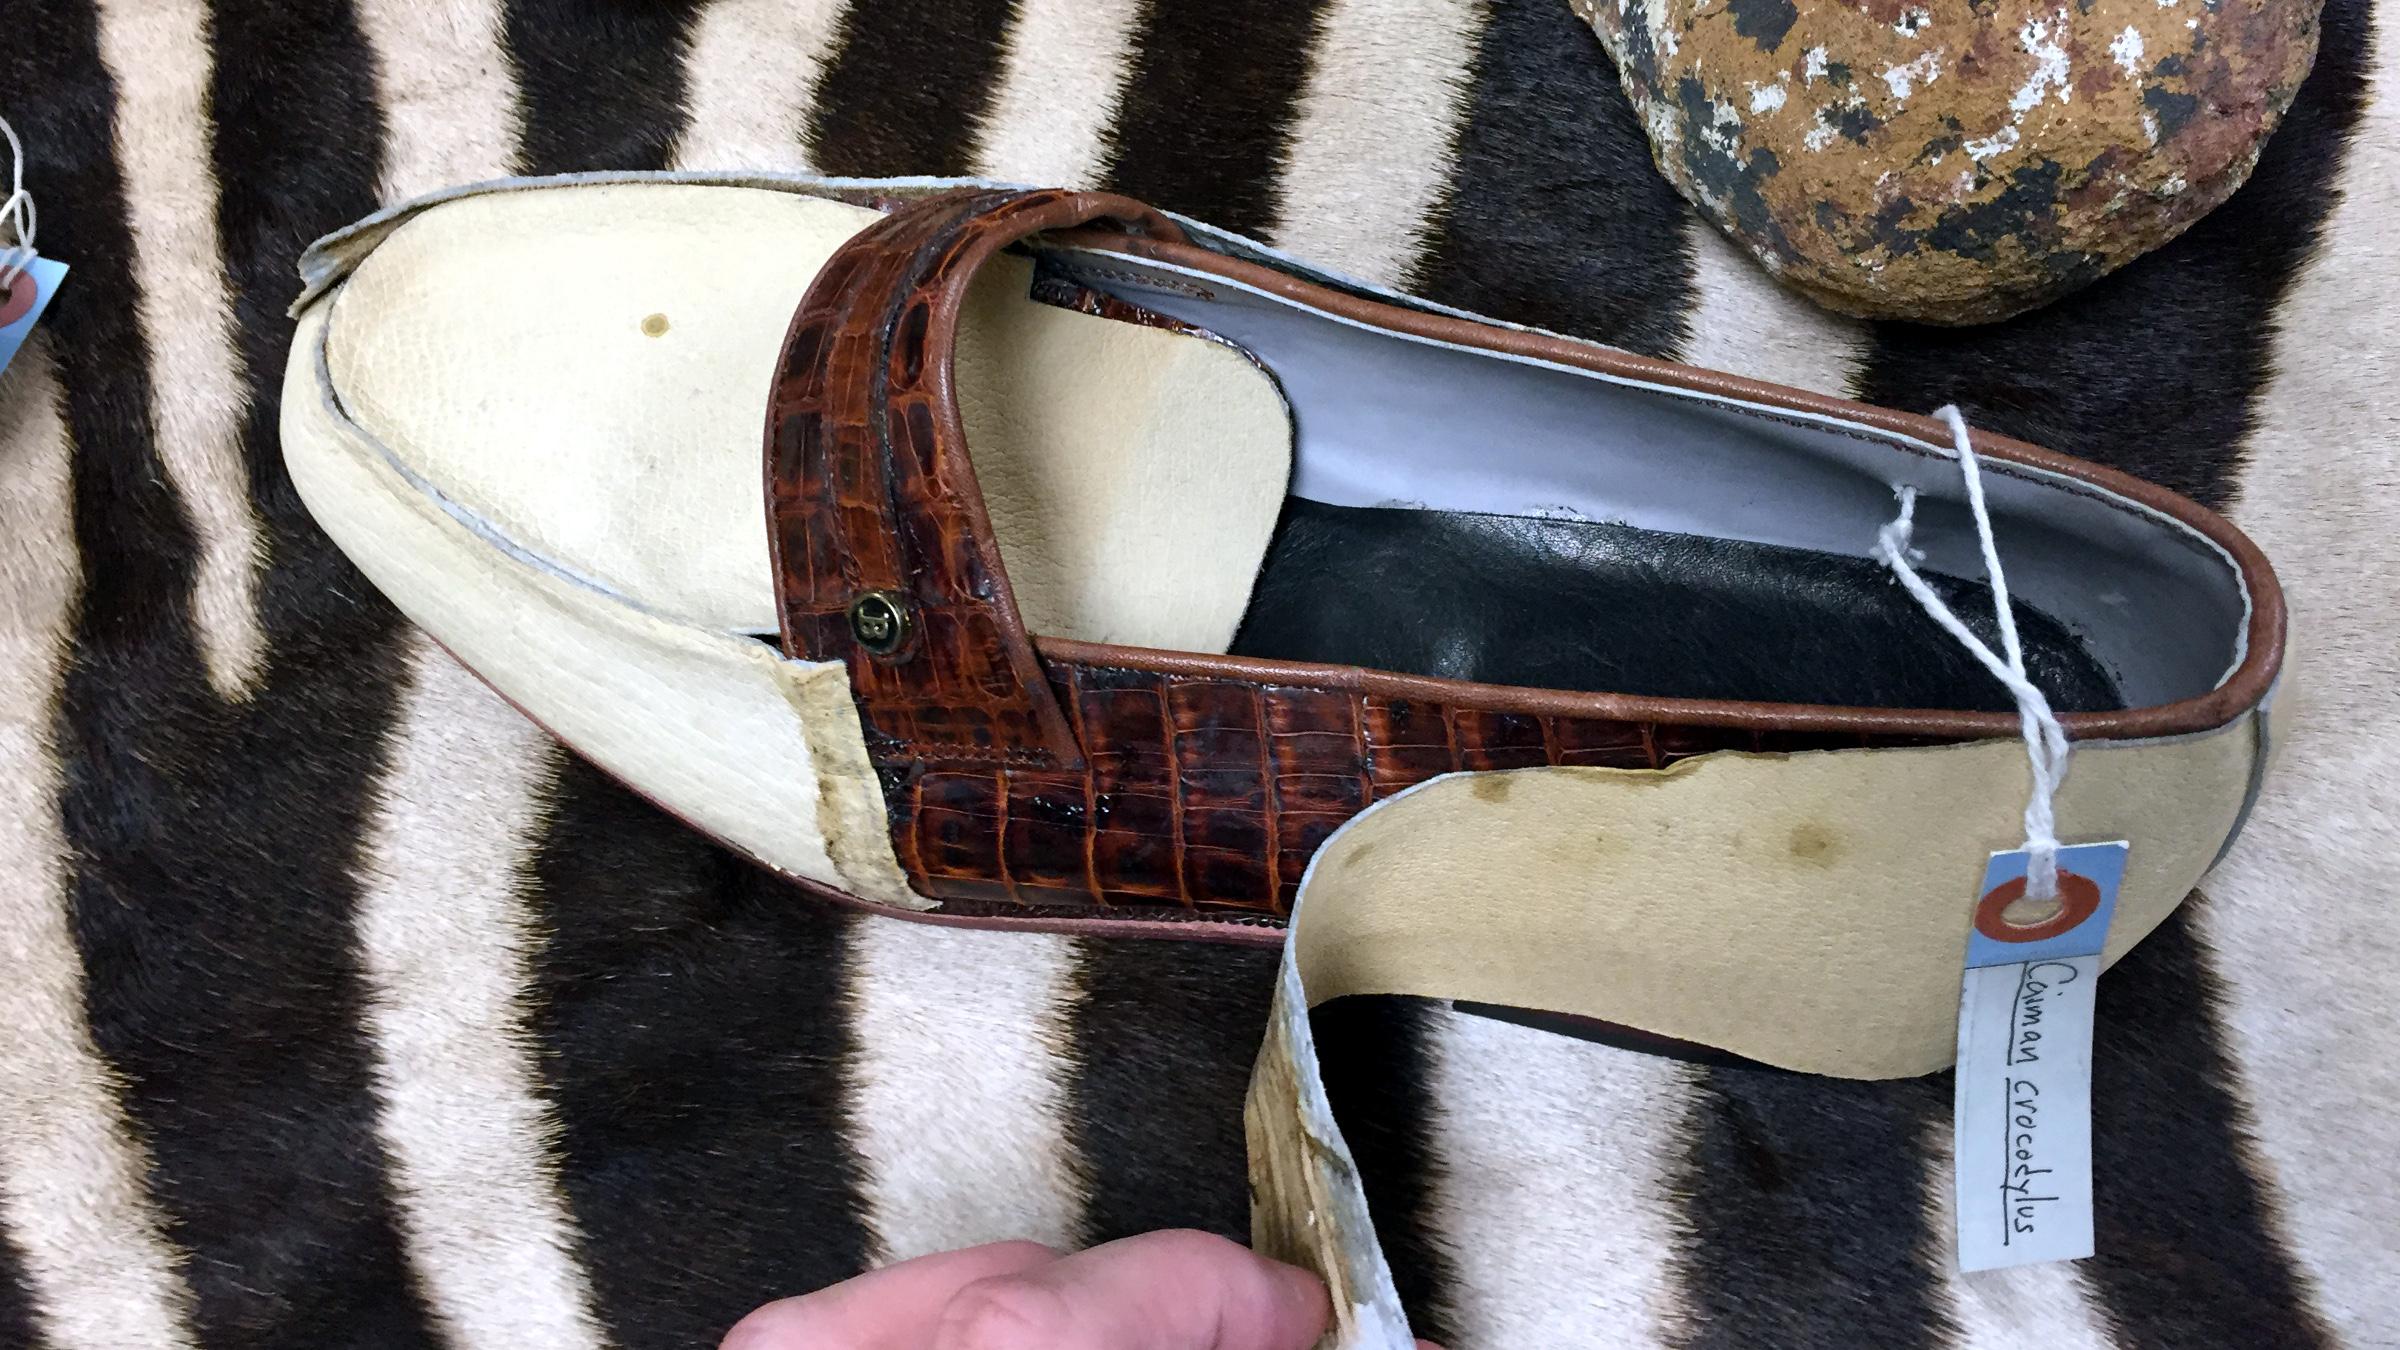 A Cayman crocodile skin shoe hidden behind cheap leather covering.